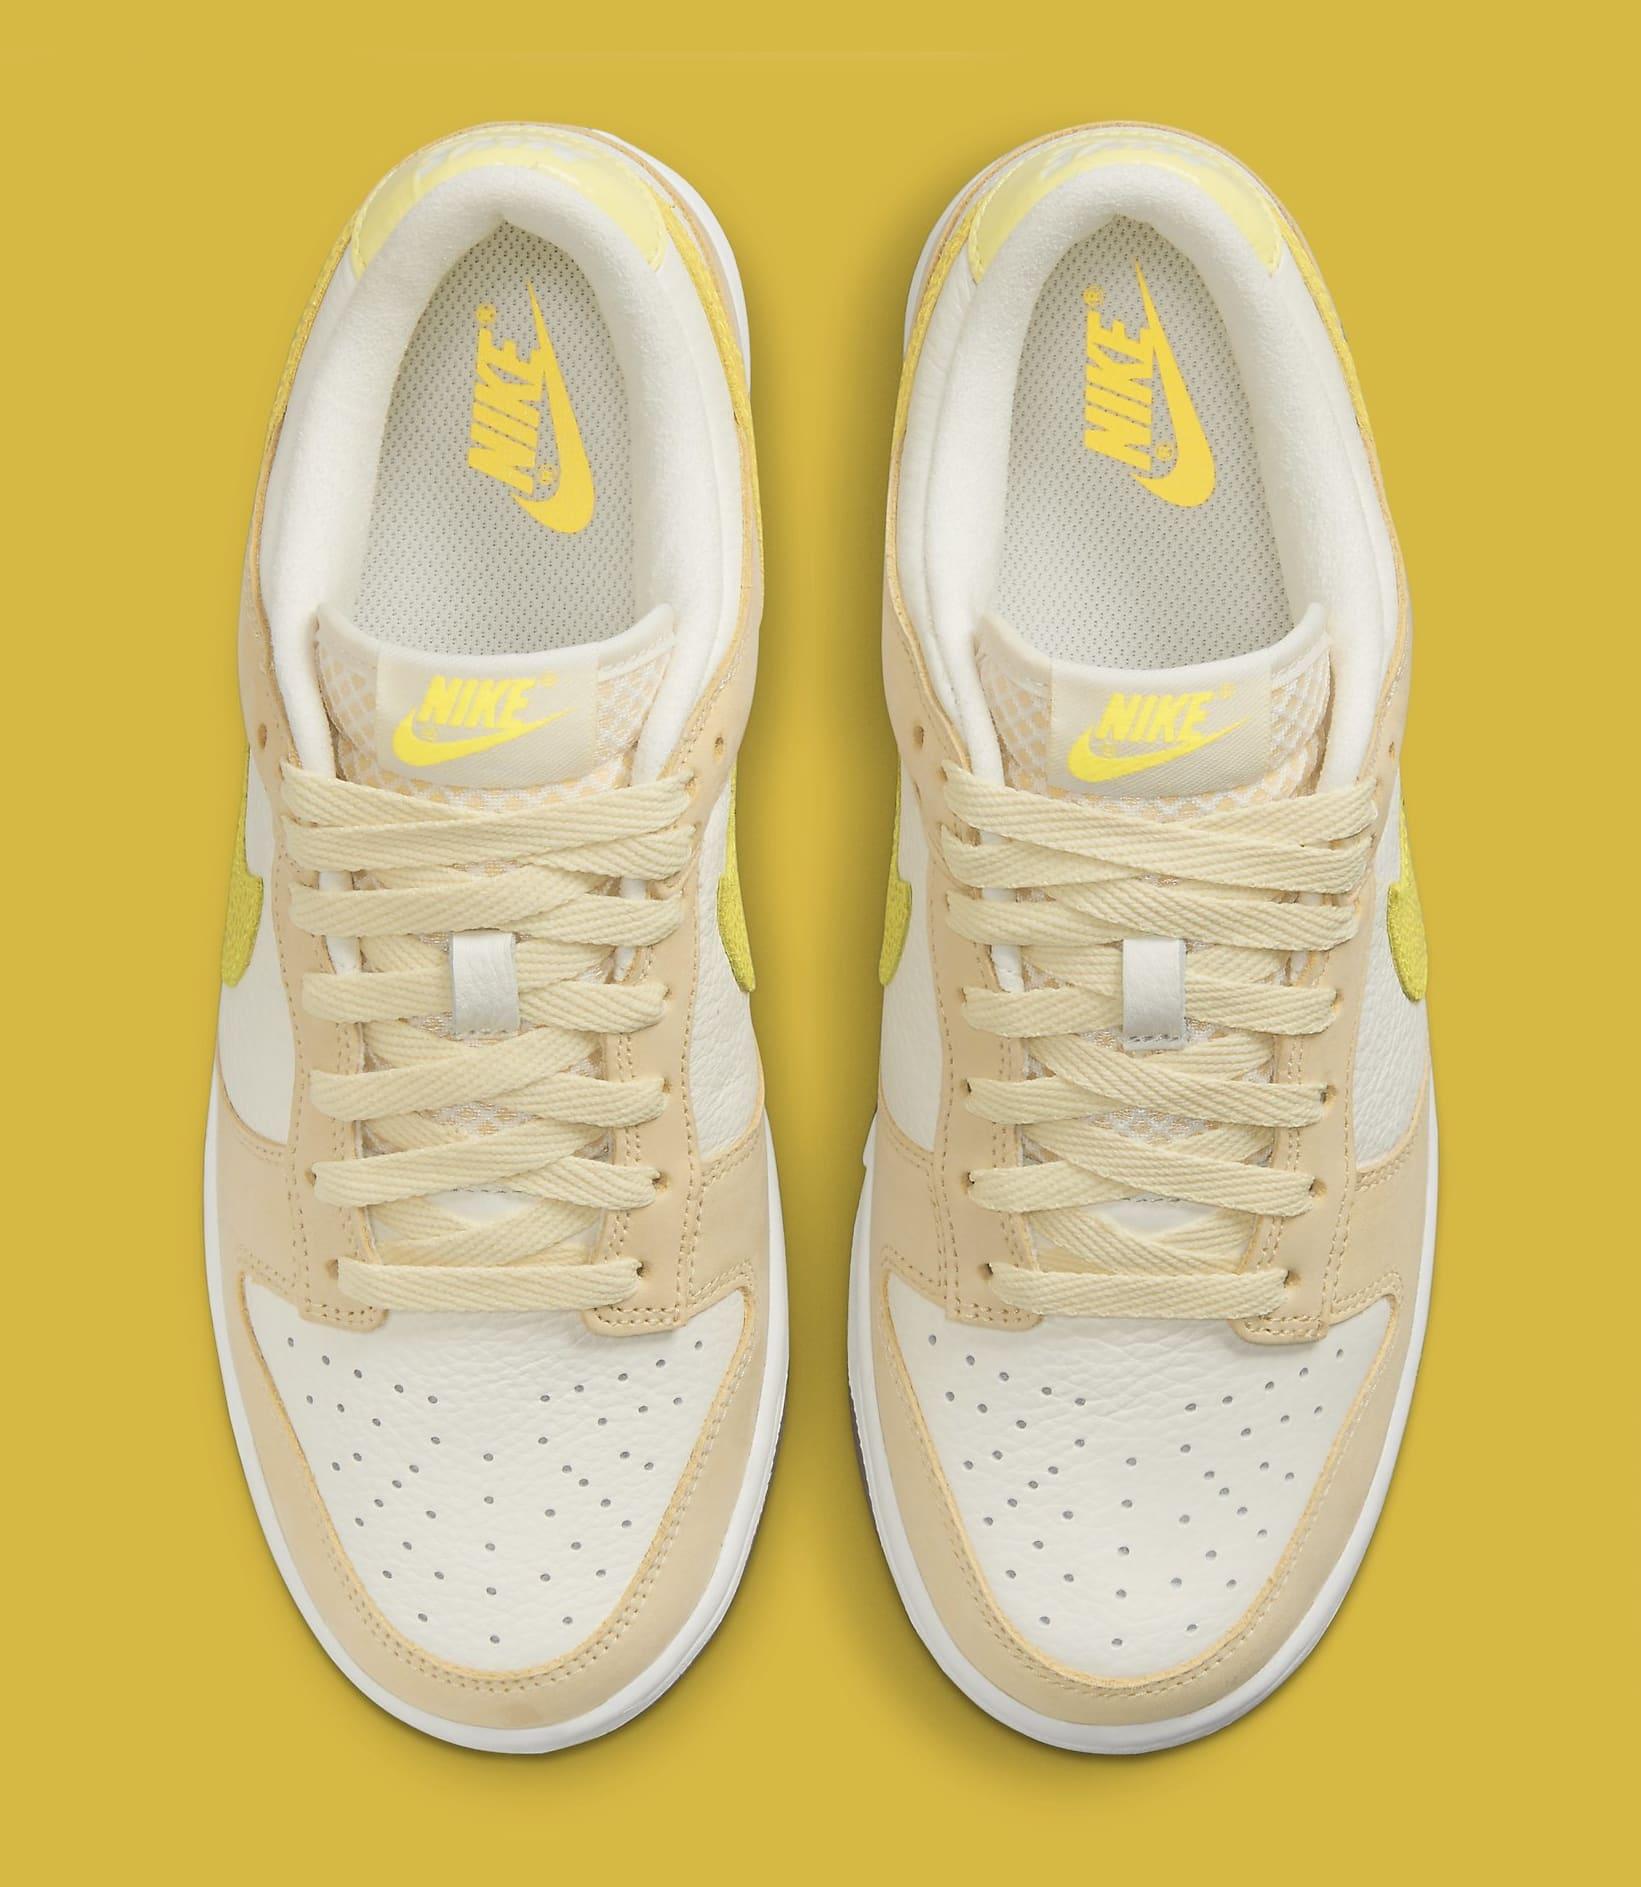 Nike Dunk Low 'Lemon Drop' DJ6902-700 Top